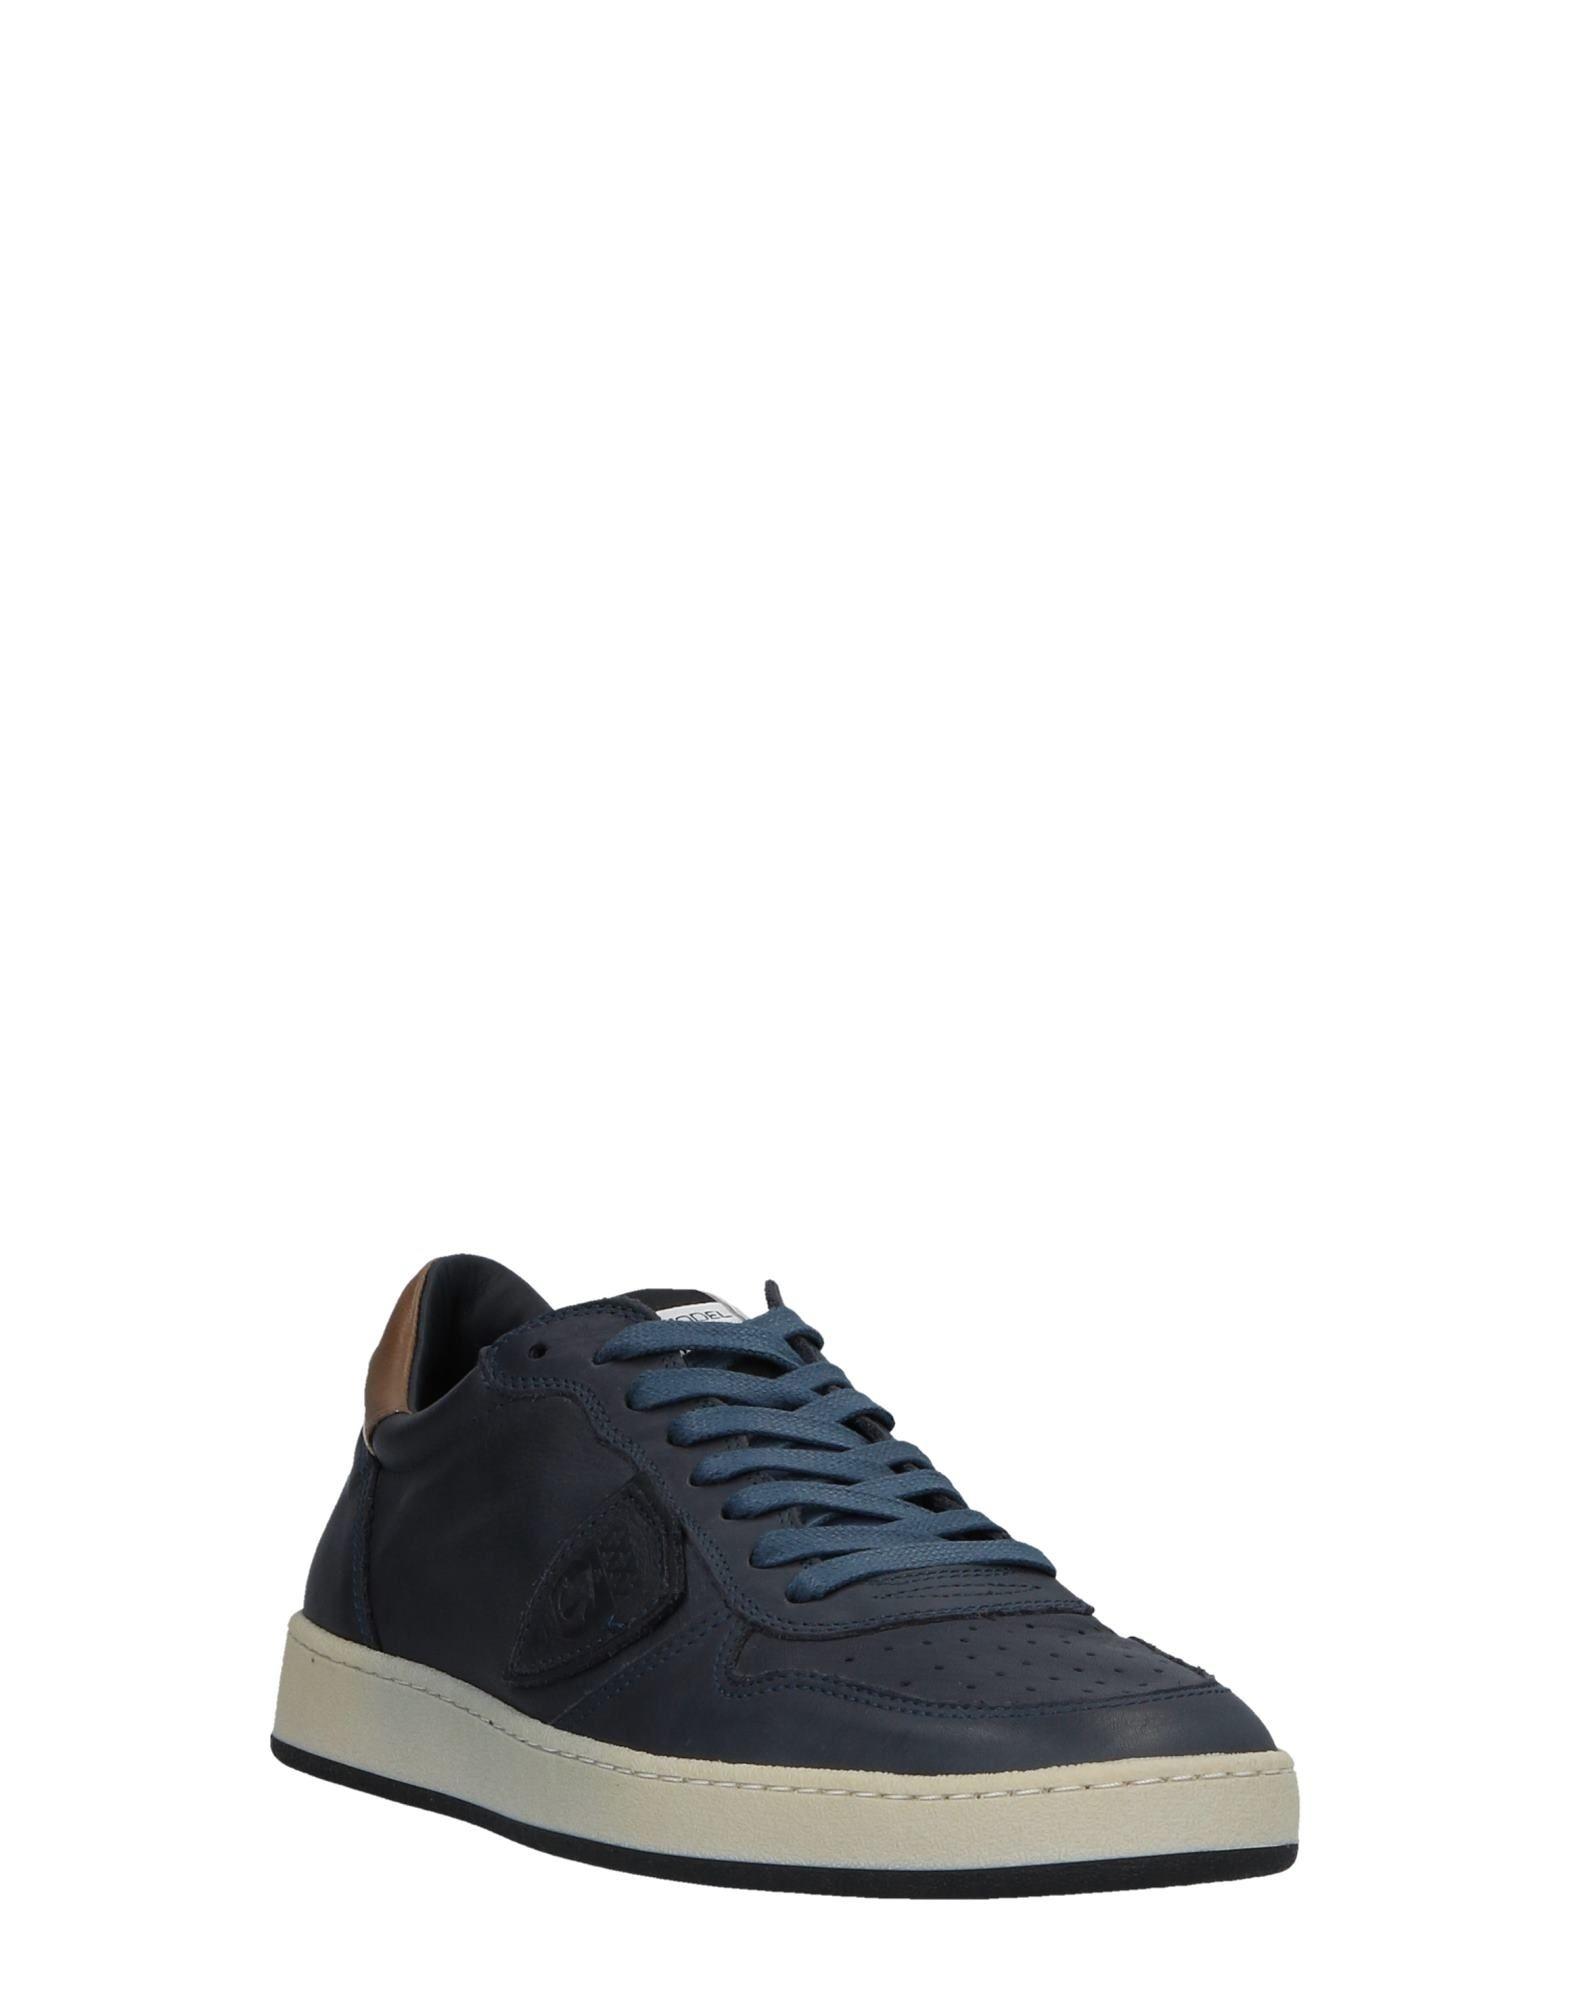 Philippe Model Sneakers Herren  Schuhe 11513569EH Gute Qualität beliebte Schuhe  0b58b4